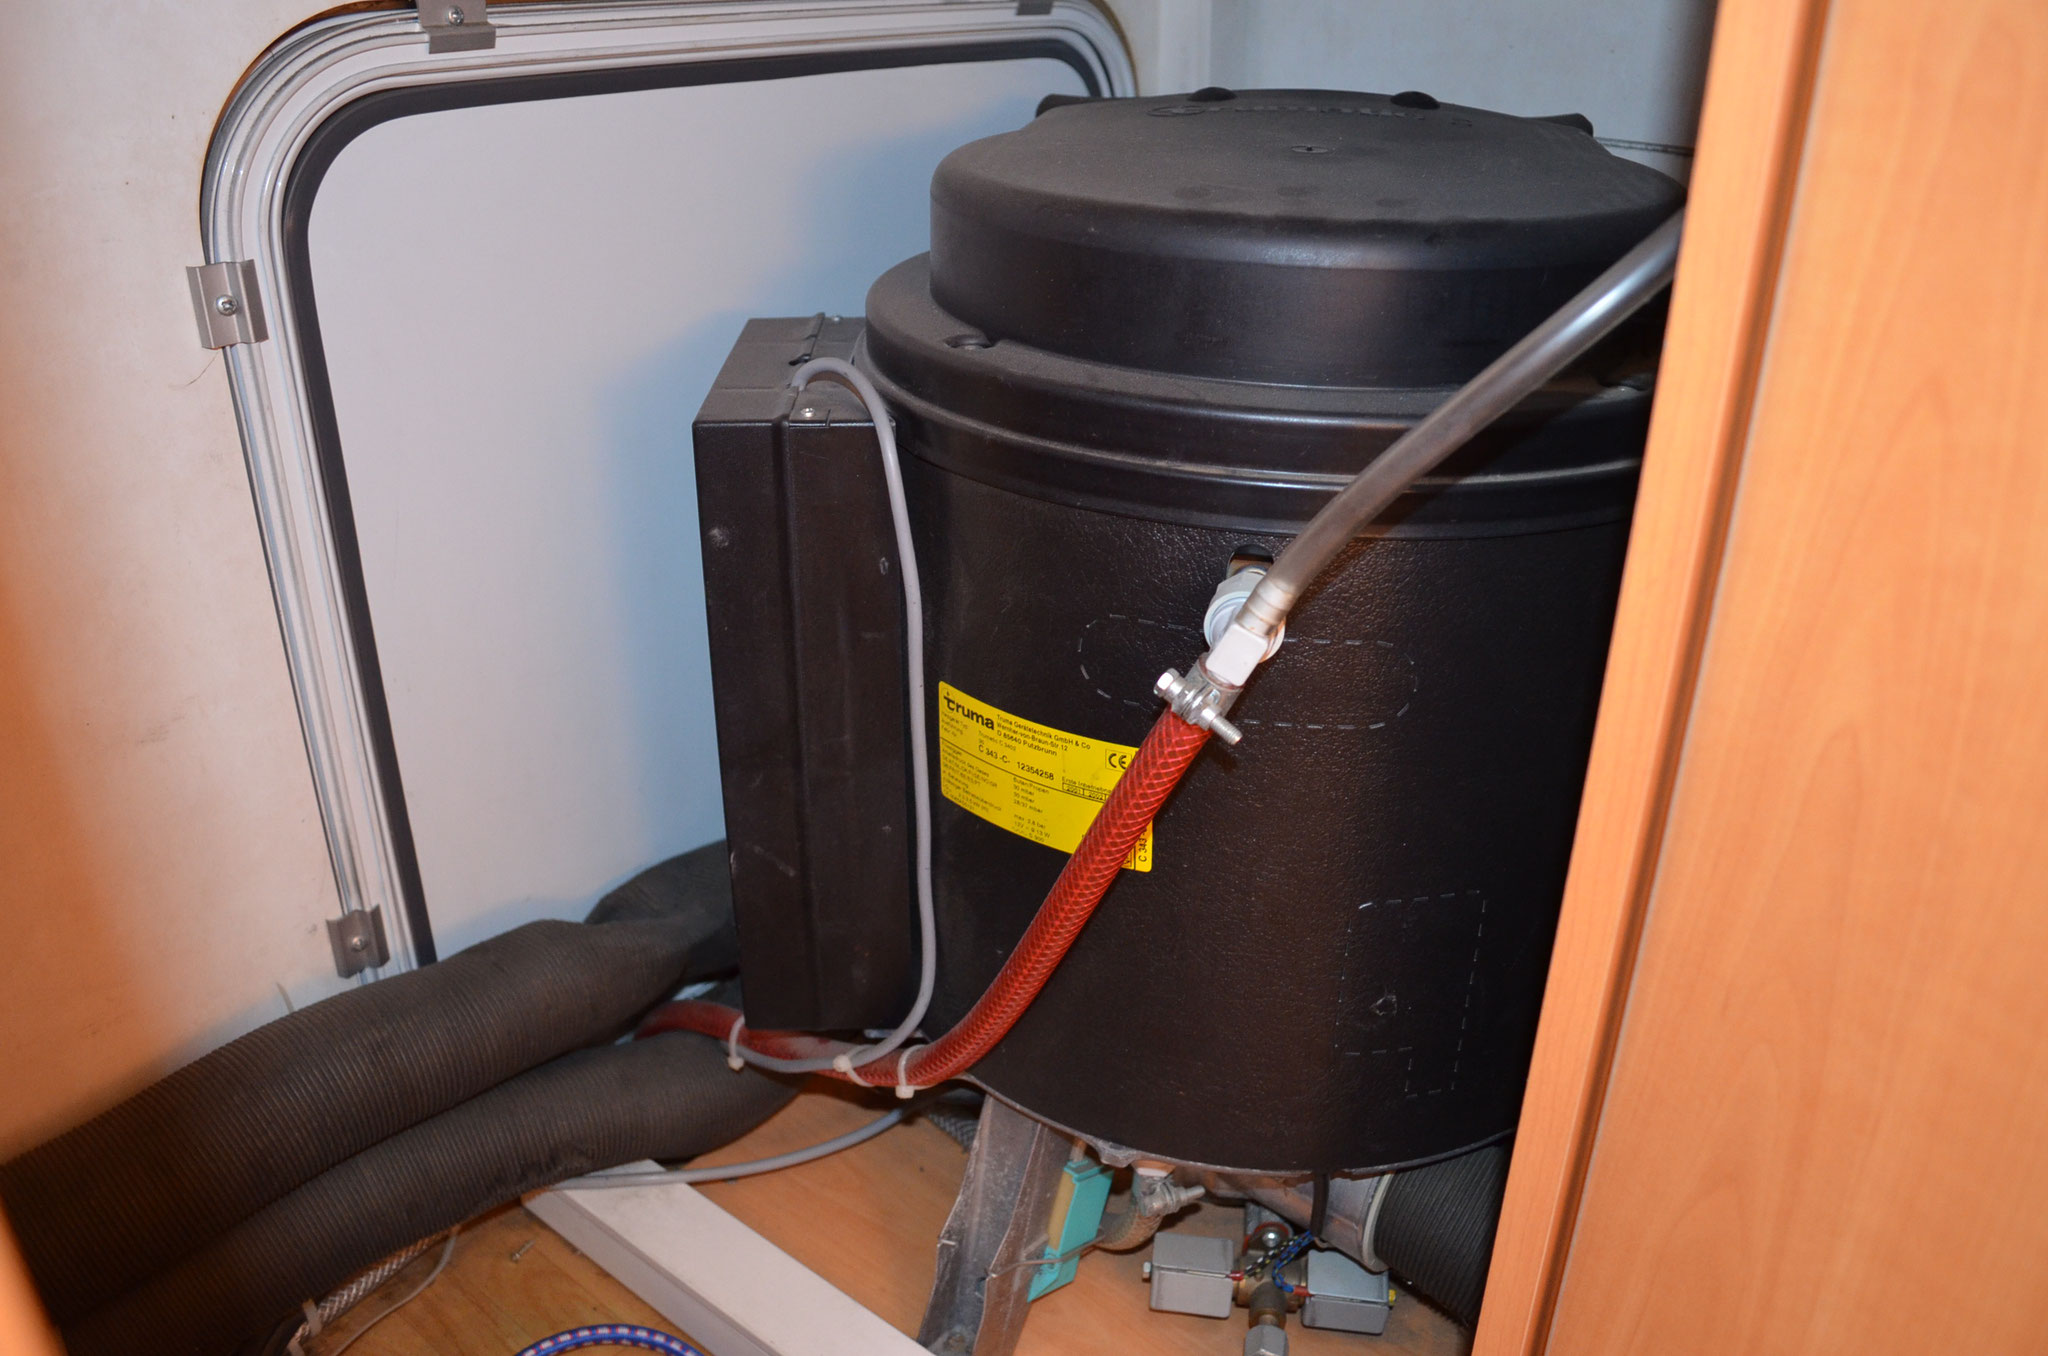 Heizung, Warmwasseraufbereitung